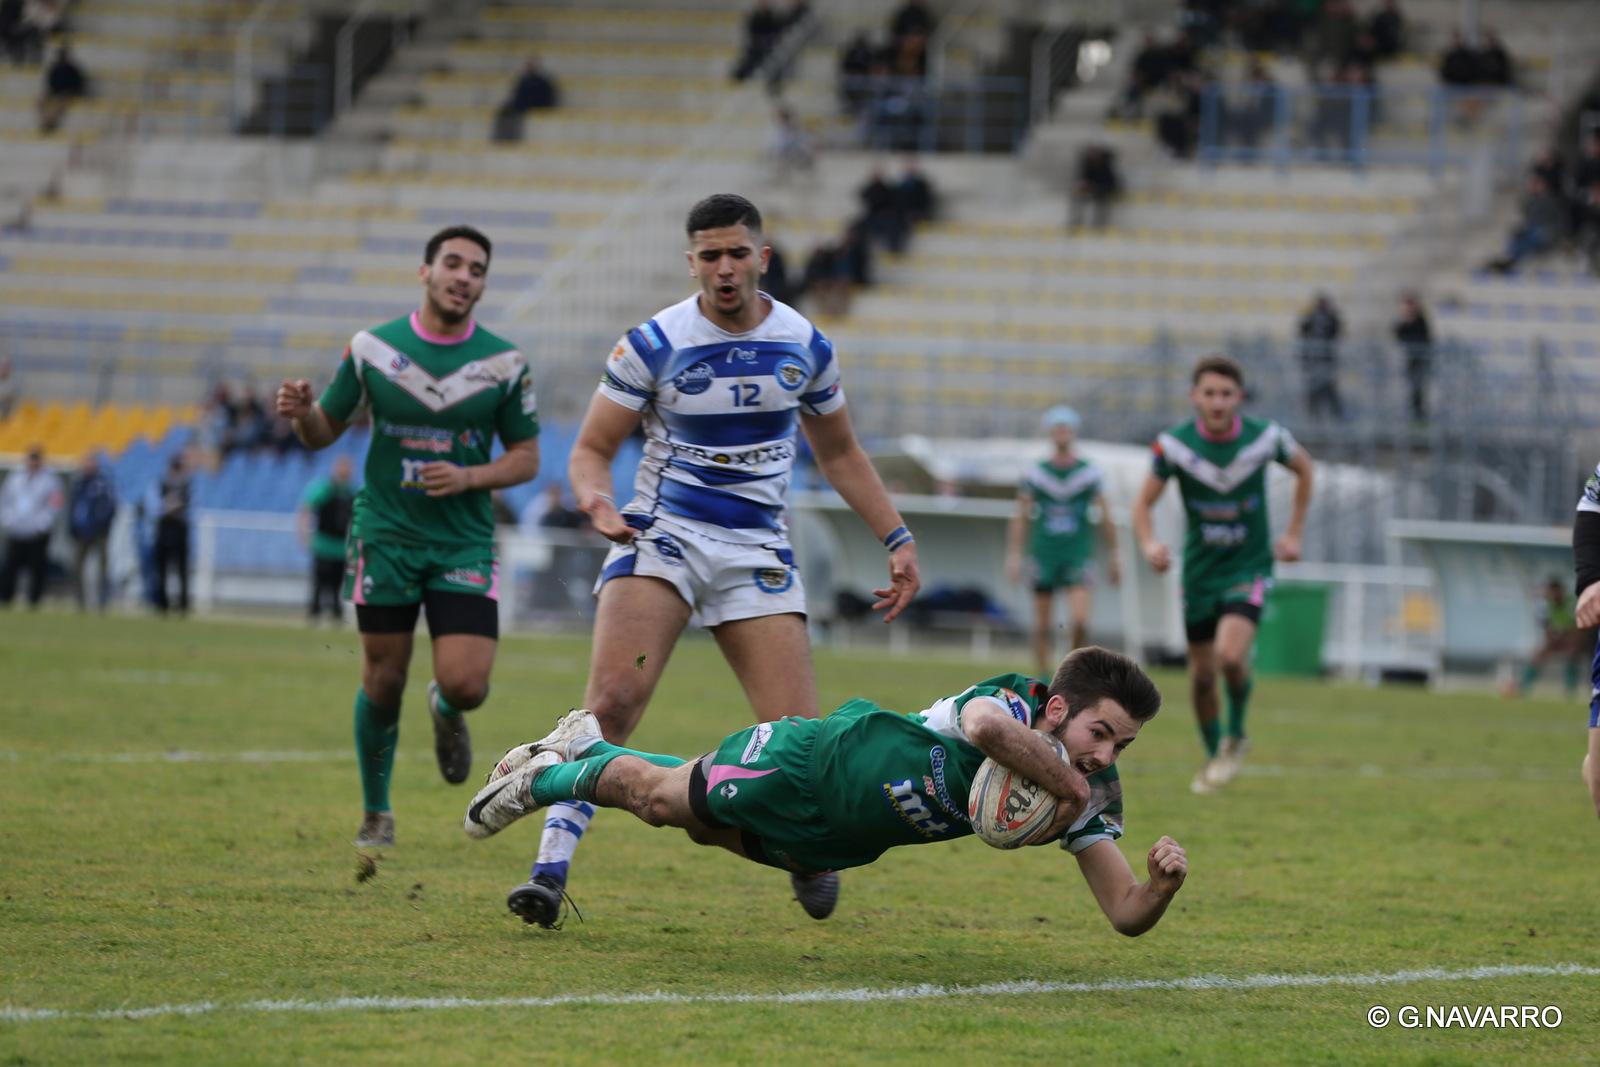 Lezignan Avignon U19